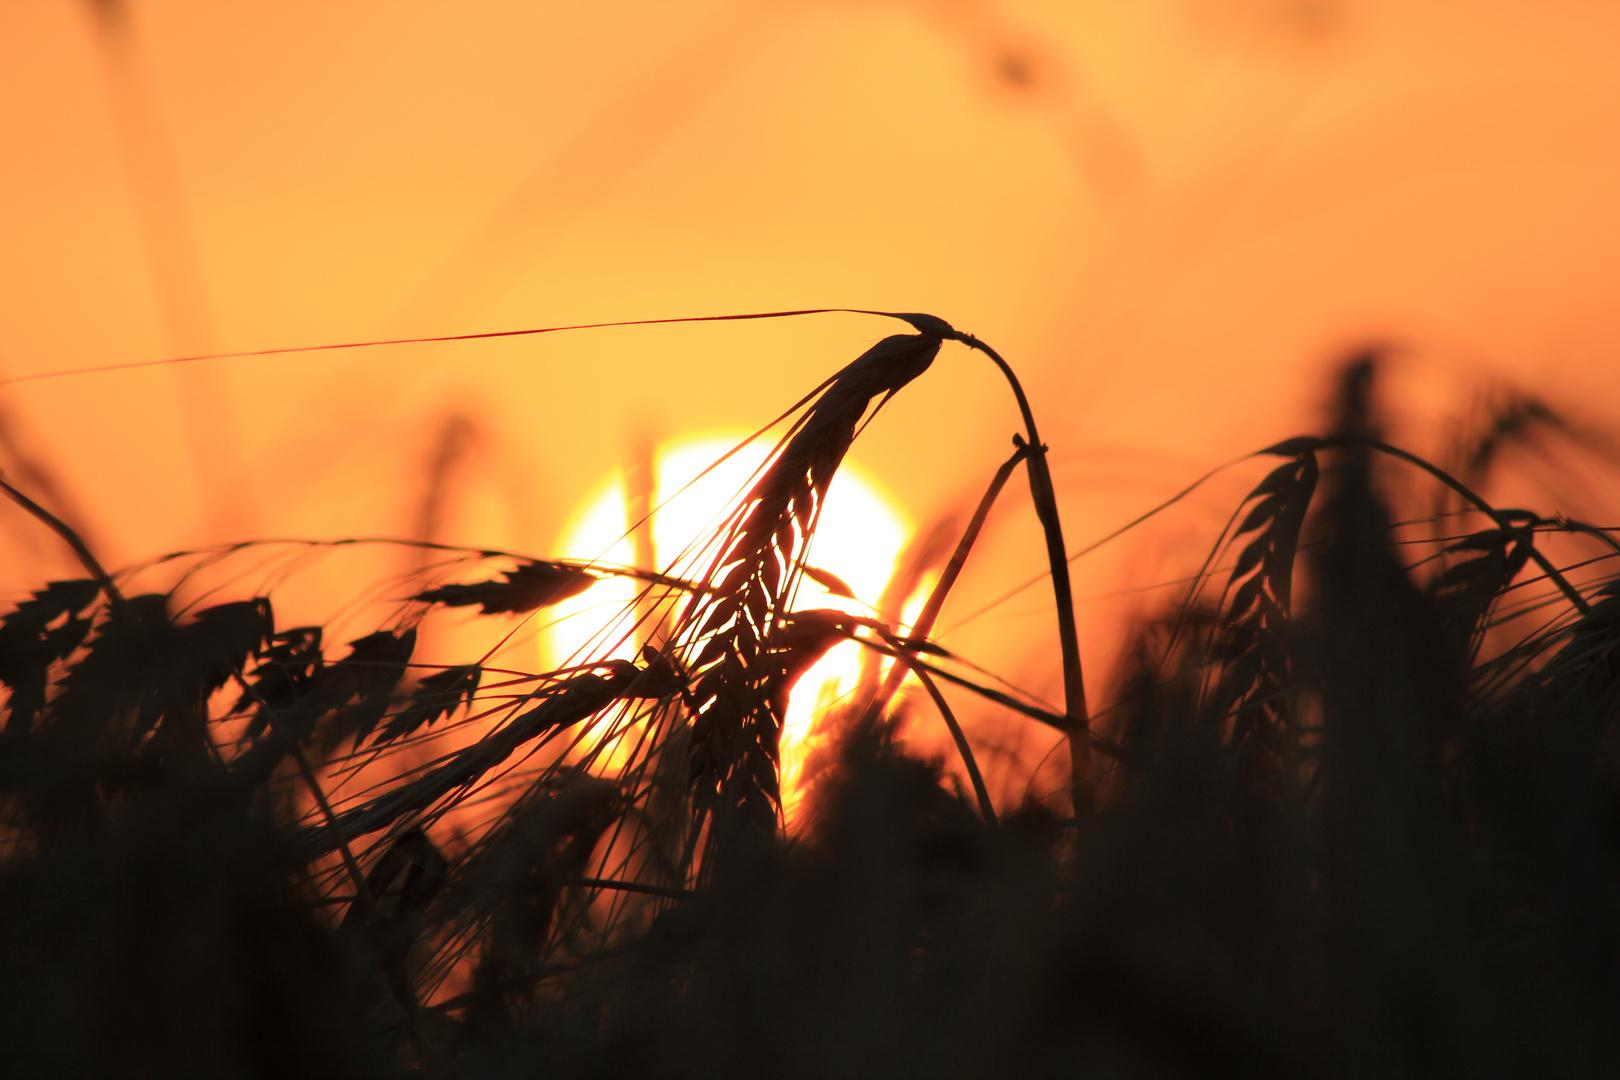 Sommer Sonnenuntergang II